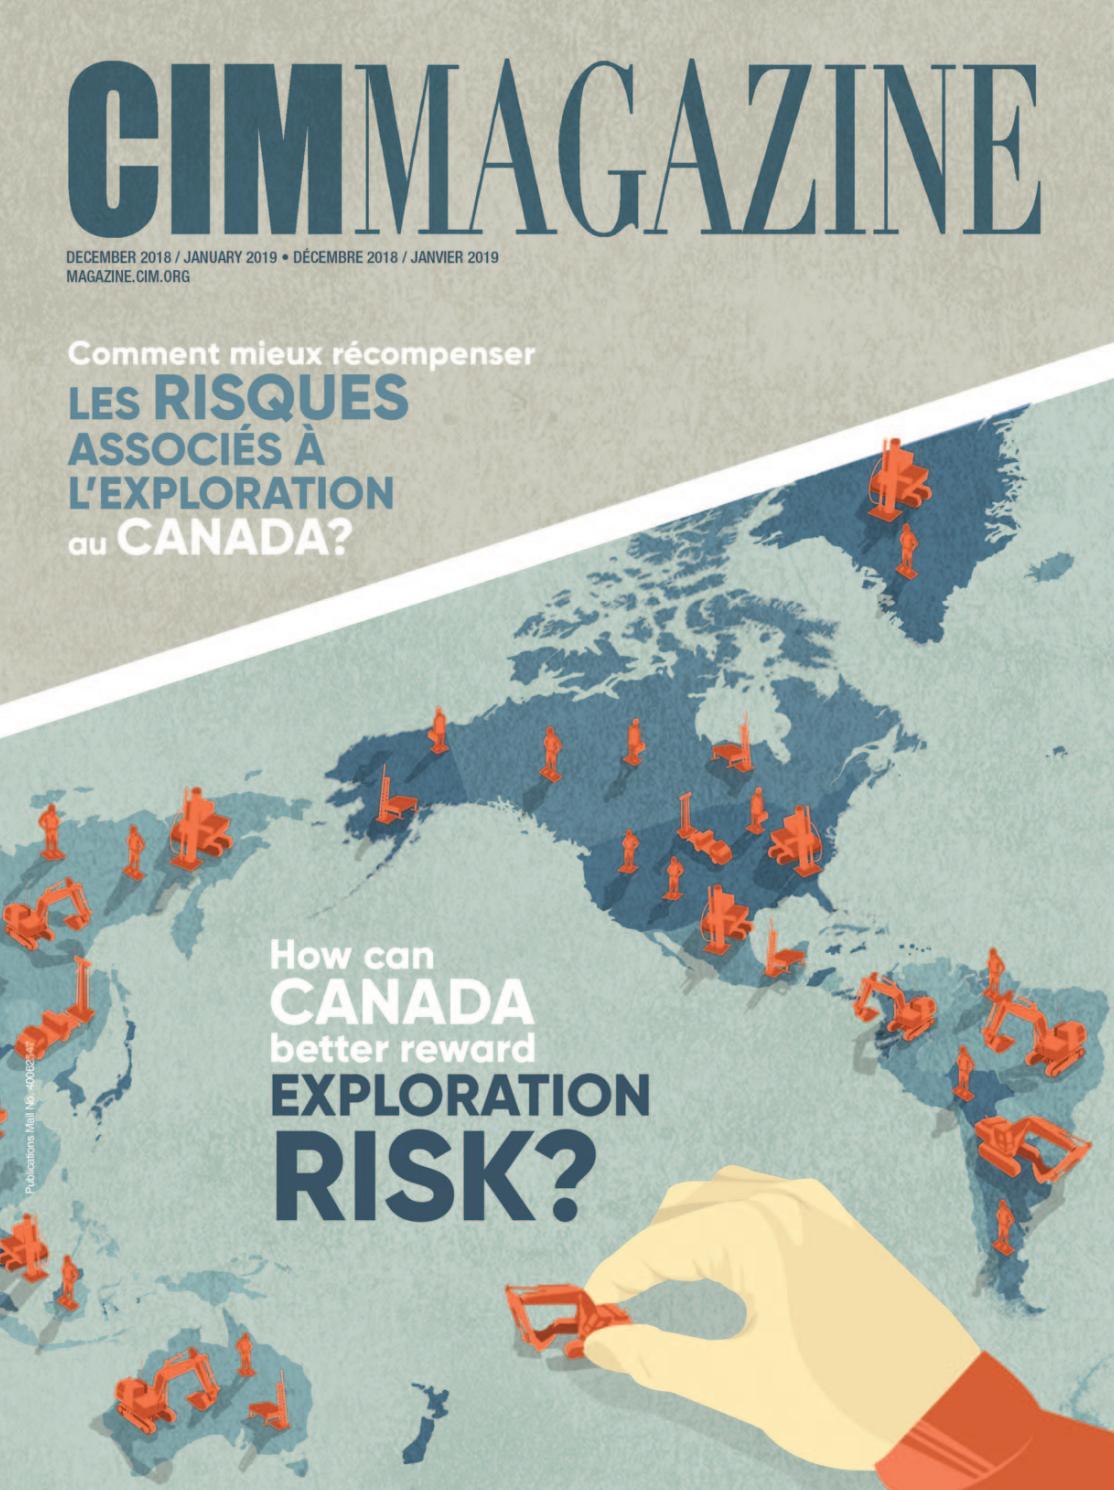 Comment Savoir Si Induction cim magazine december 2018 - january 2019cim-icm